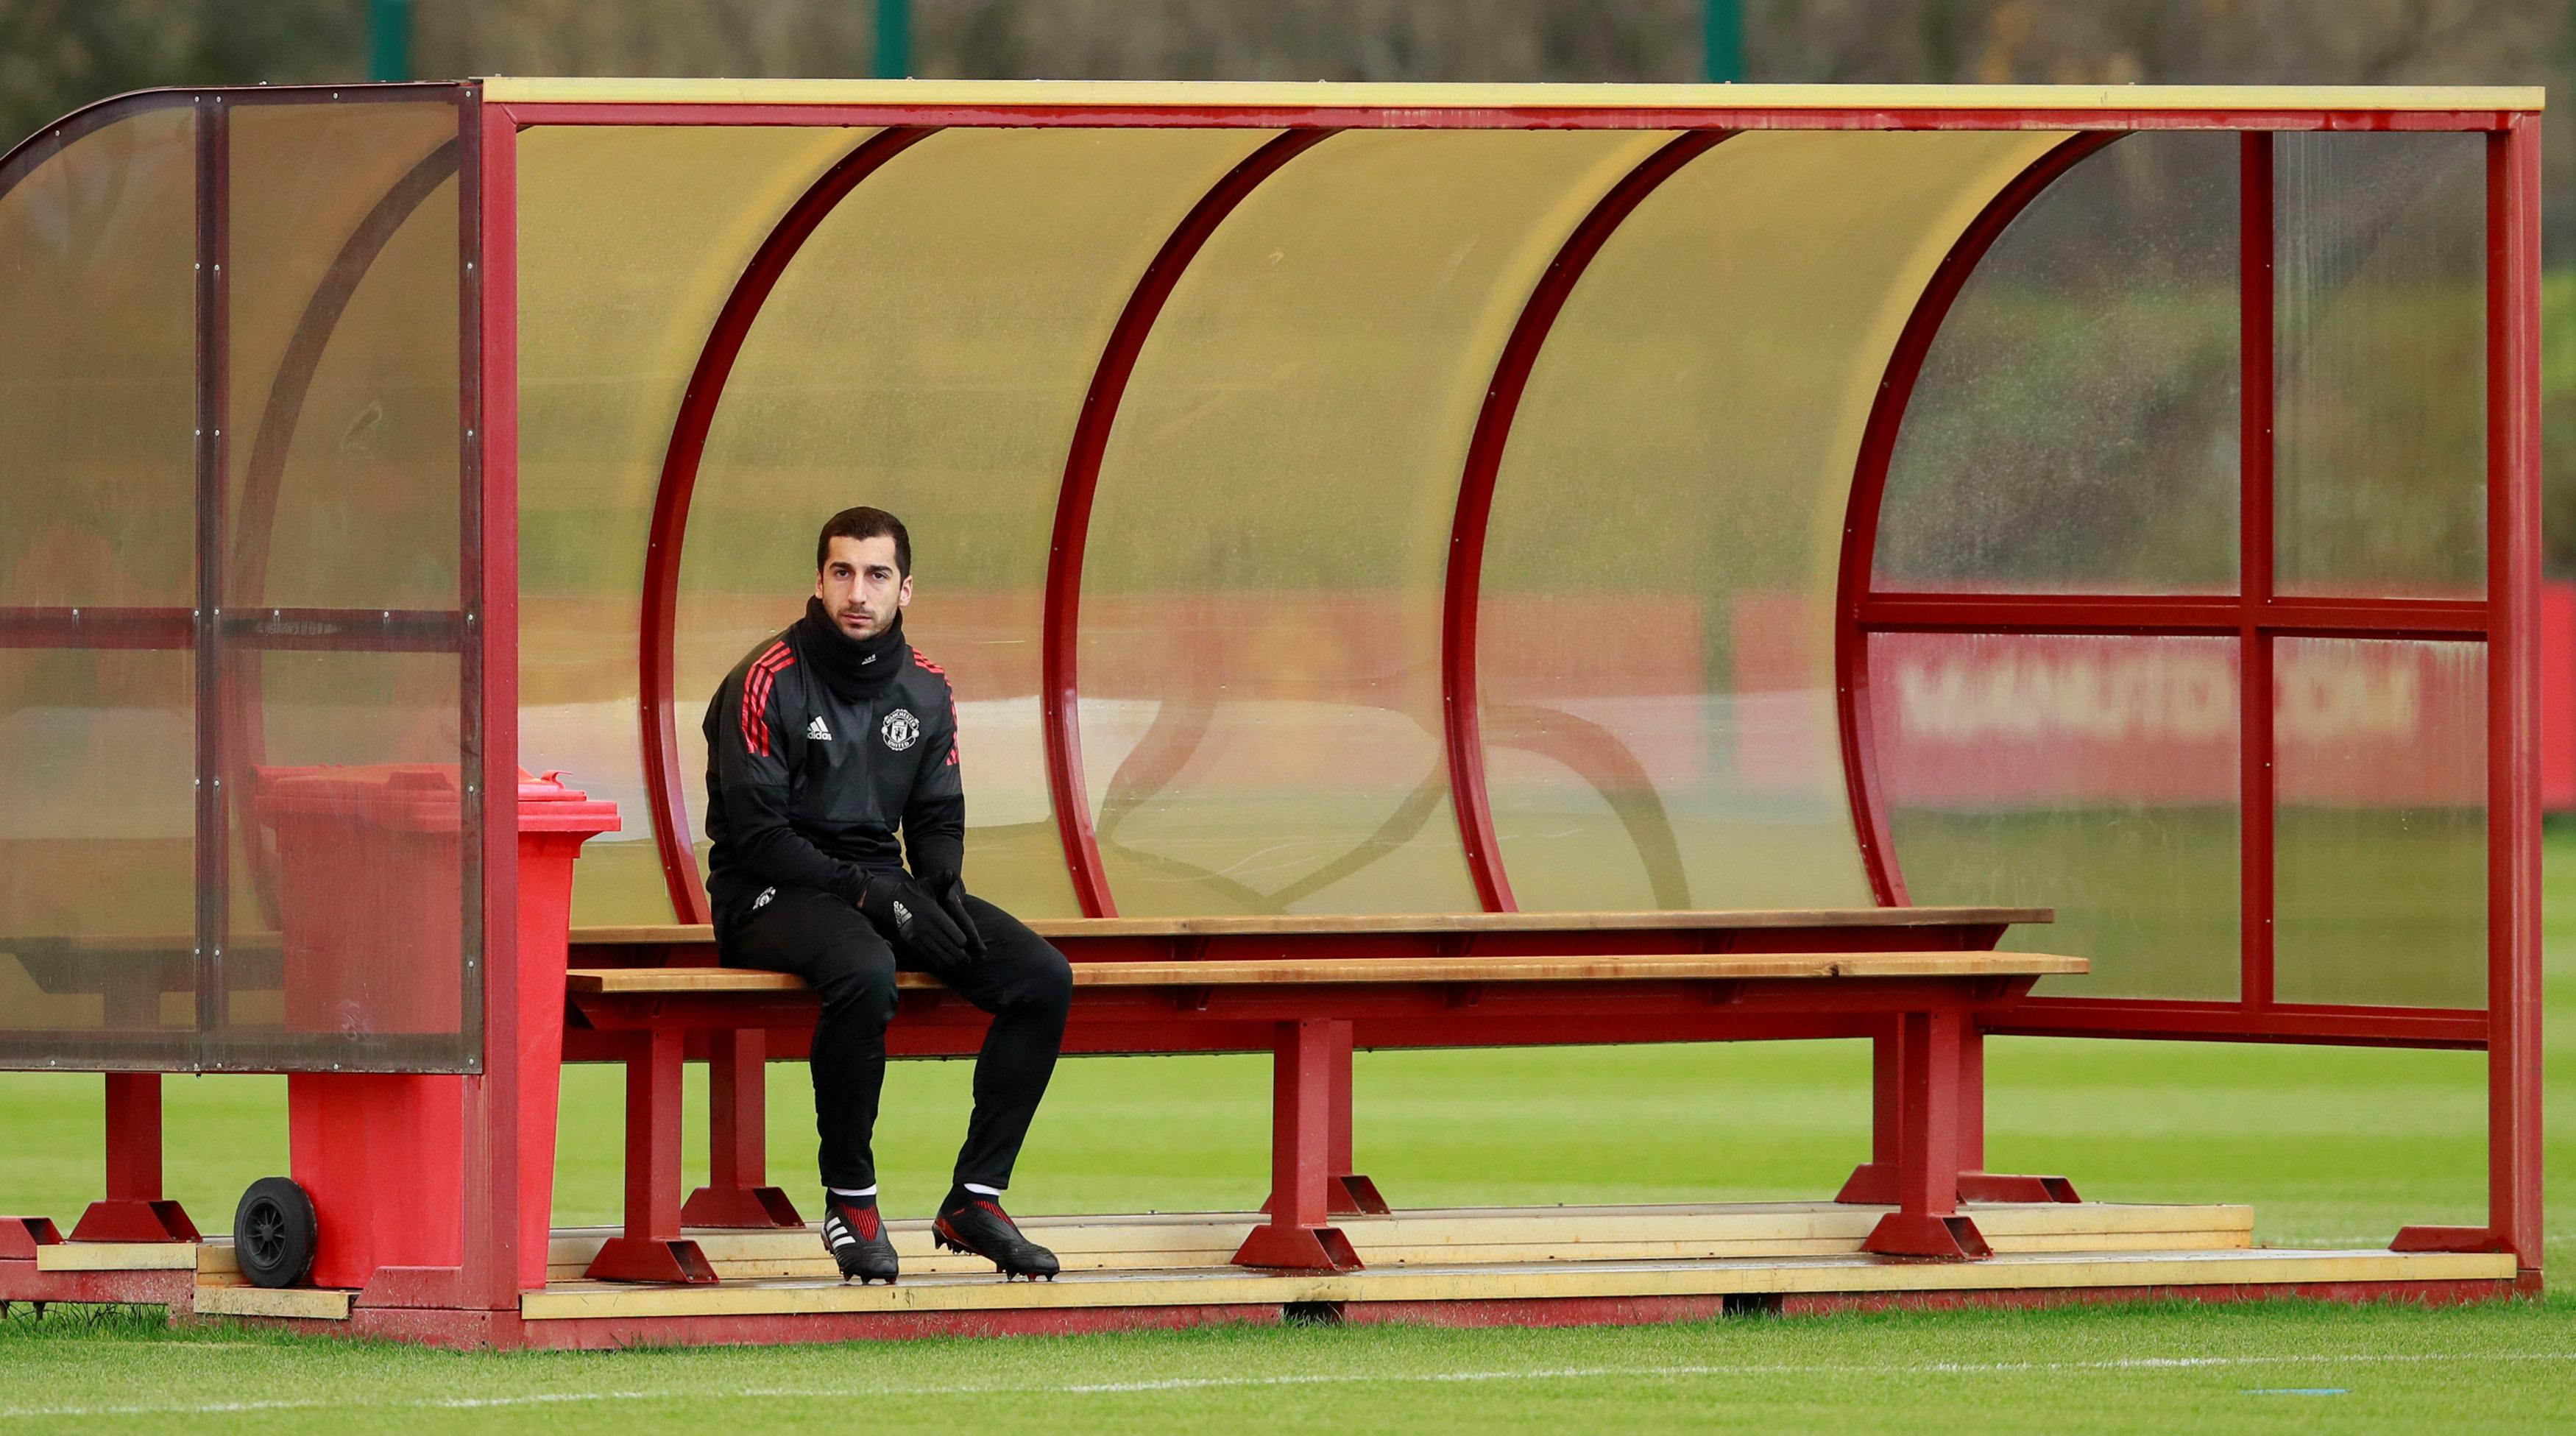 Football - Transferts - Que vaut Mkhitaryan, le nouveau renfort d'Arsenal ?